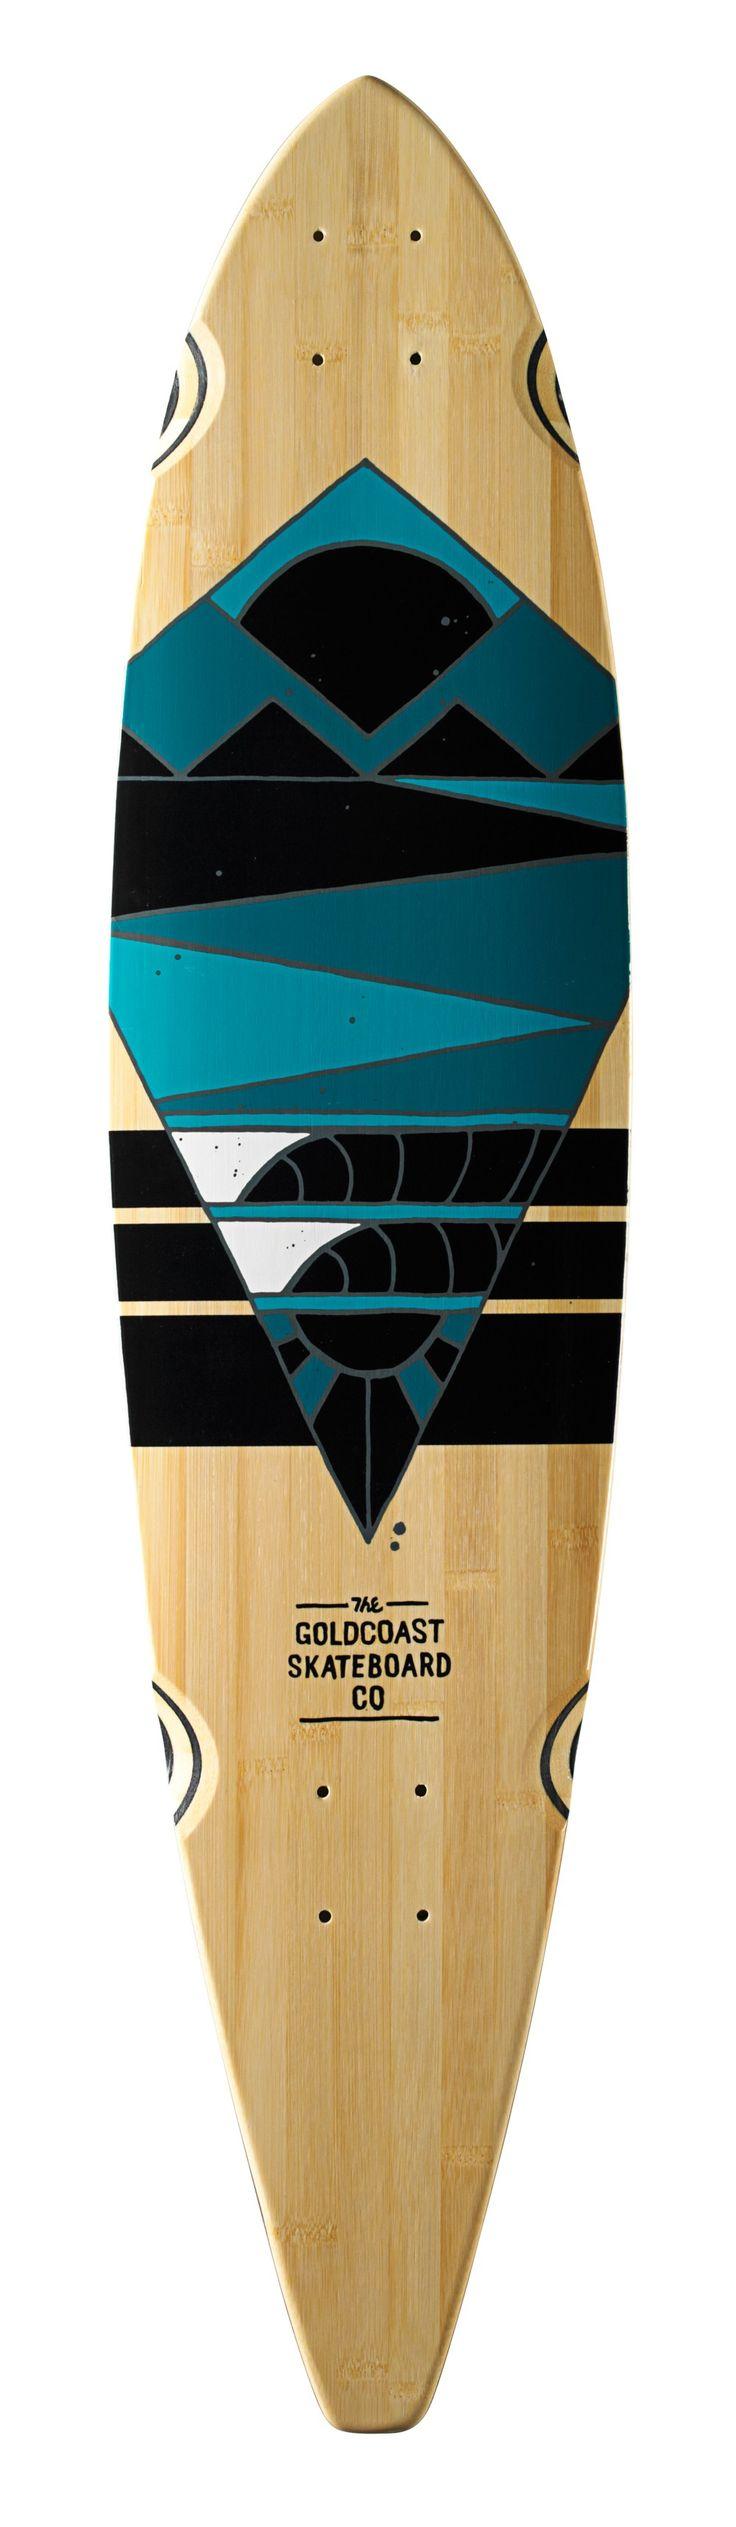 NEPTUNE DECK - Longboards - Decks - Skateboards